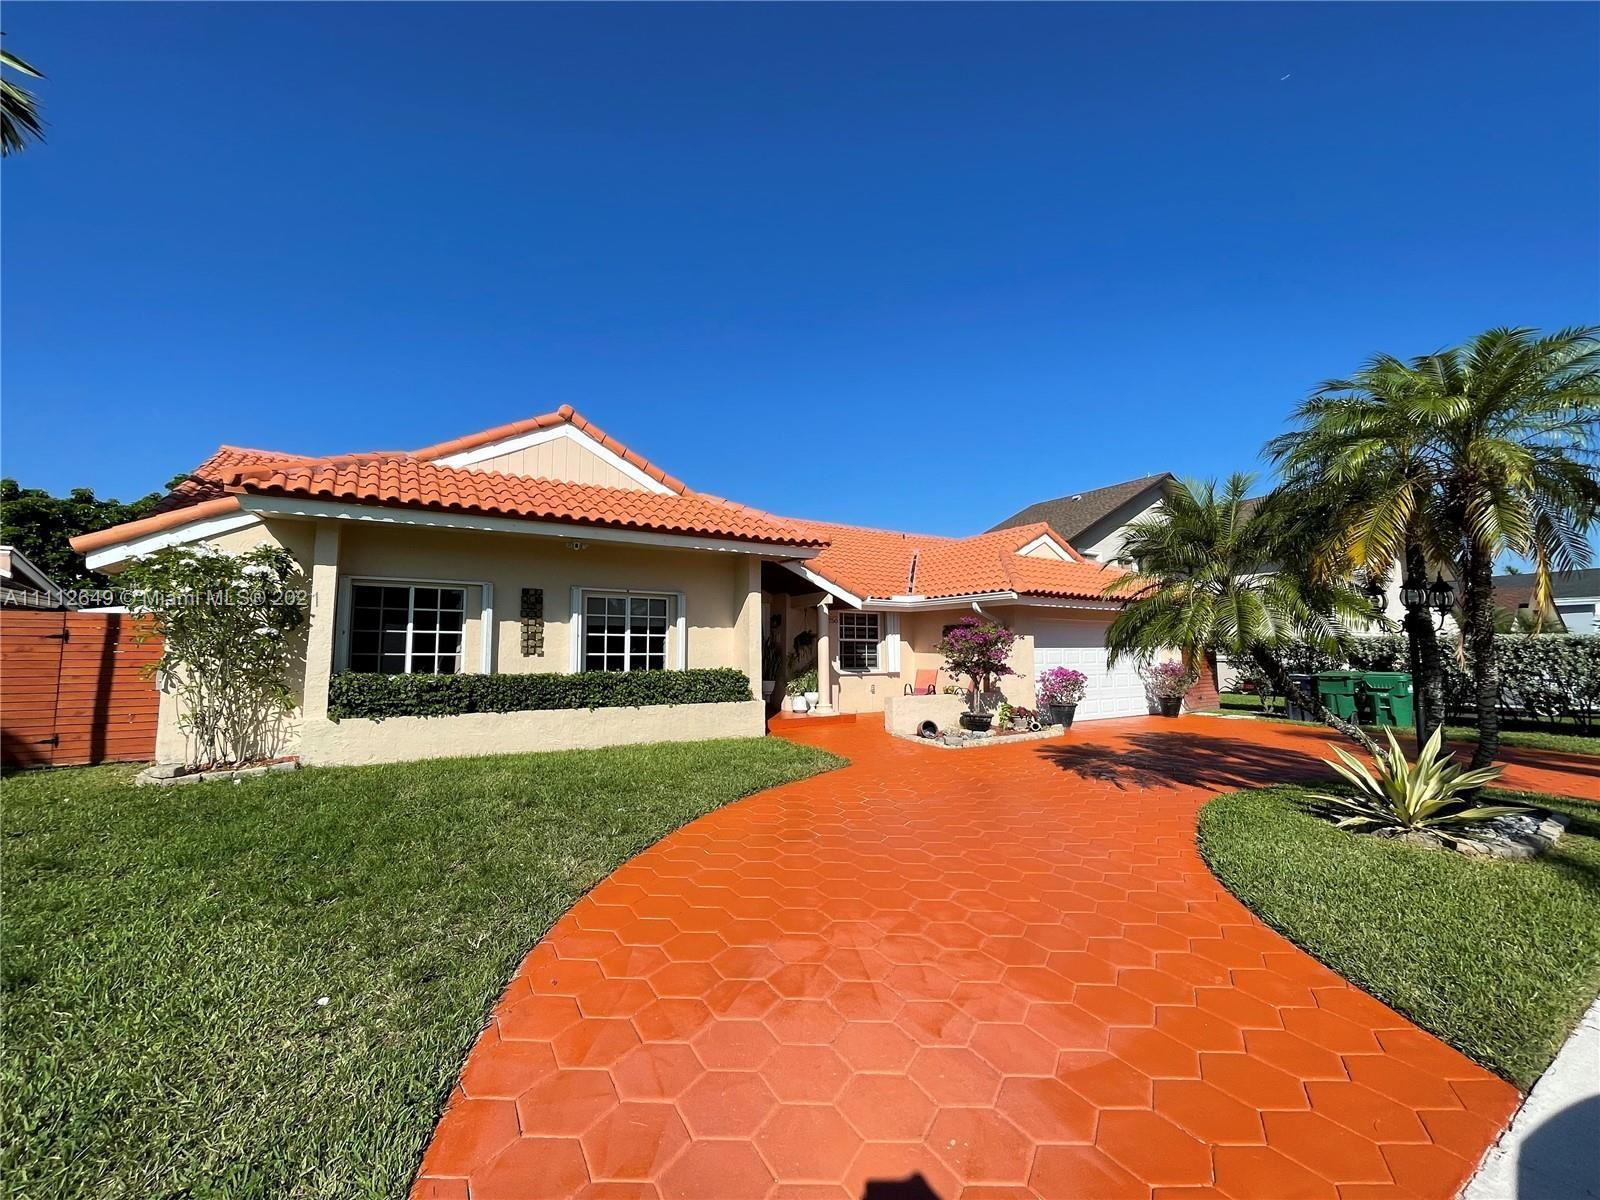 10750 SW 142nd Ave, Miami, FL 33186 - #: A11112649